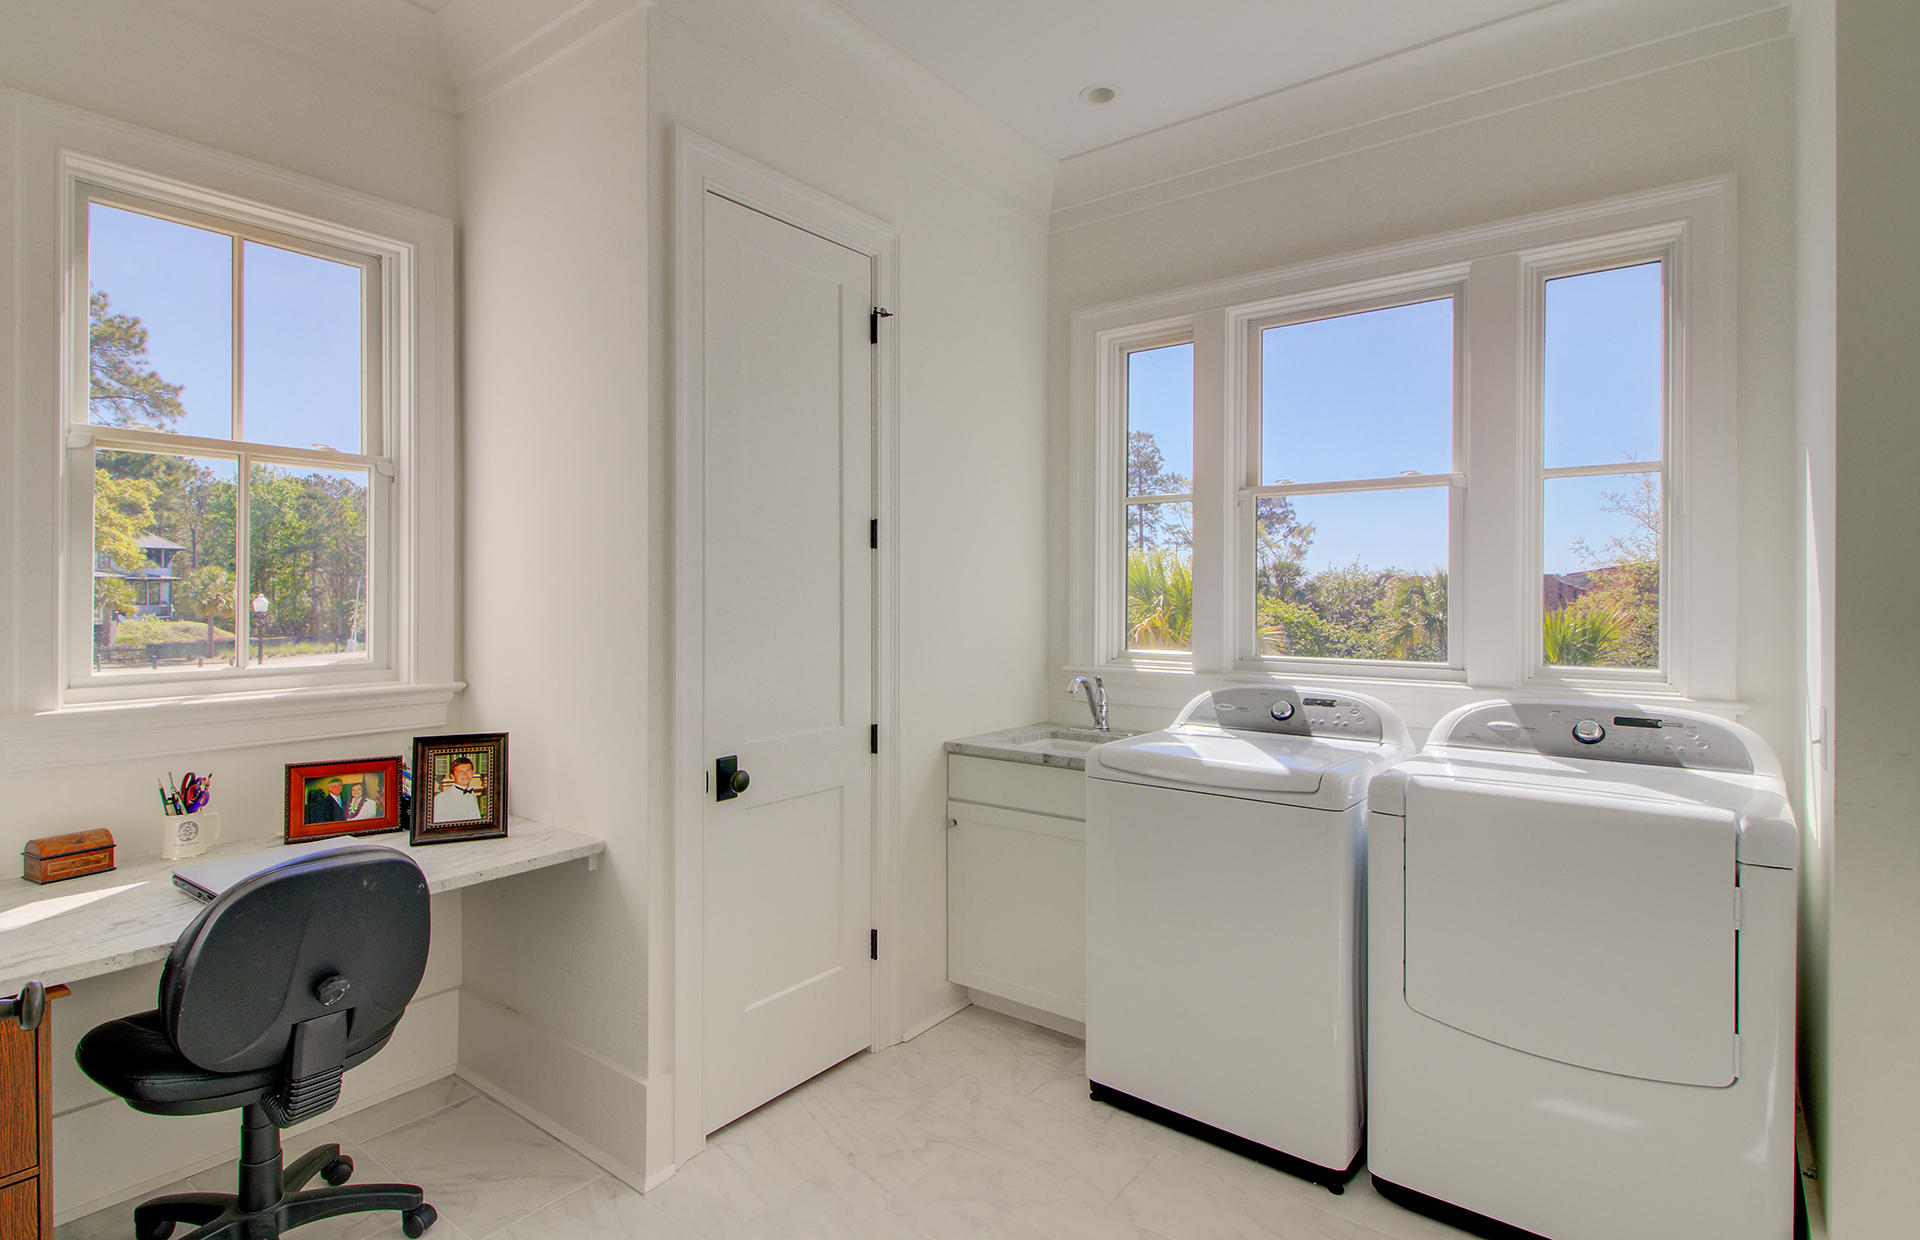 Beresford Hall Homes For Sale - 253 Grand Park, Charleston, SC - 53